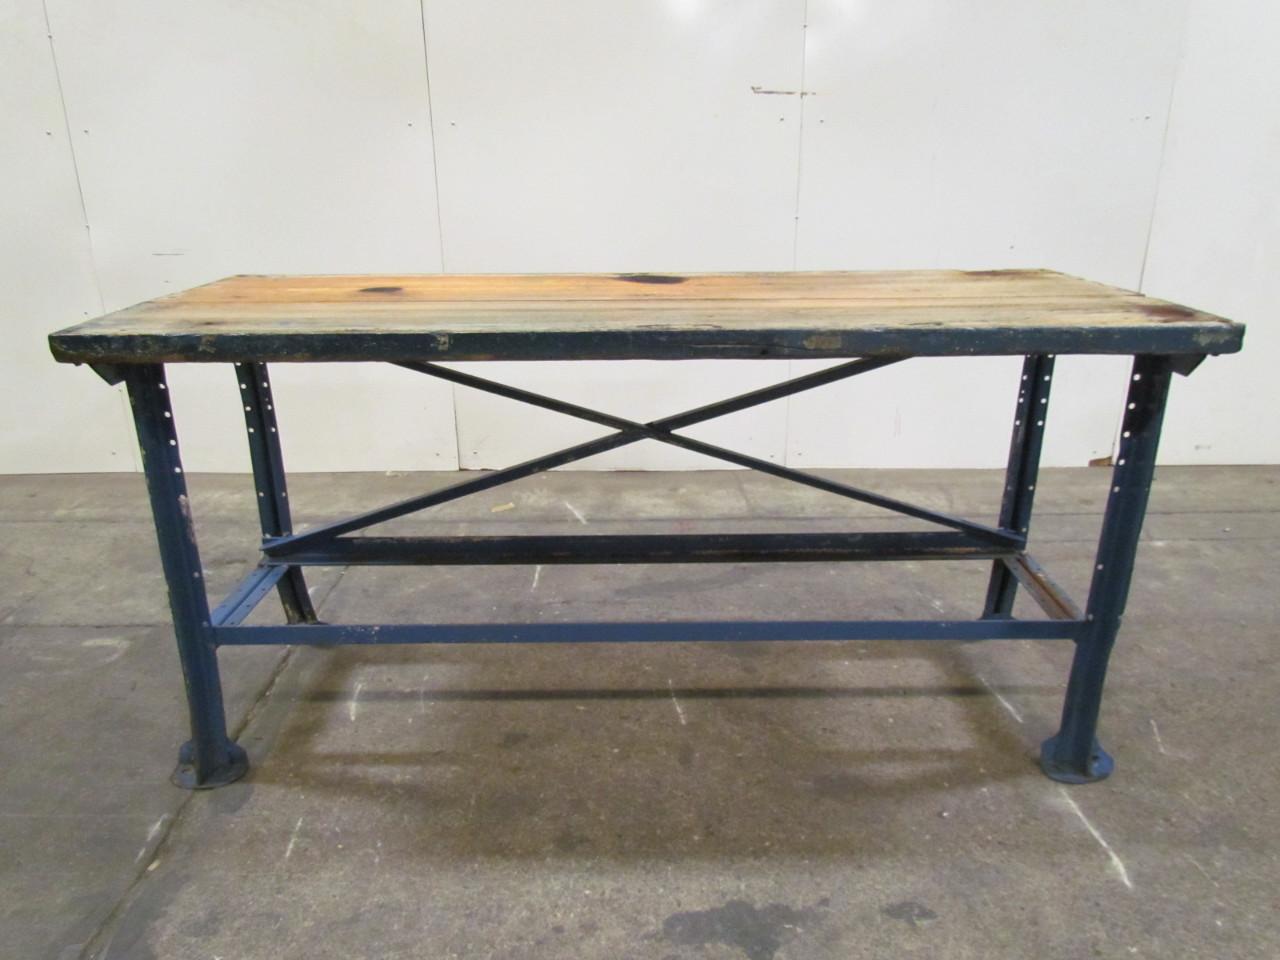 Vintage Industrial Butcher Block Workbench Table Blue Welded Steel Frame 72x28 Ebay